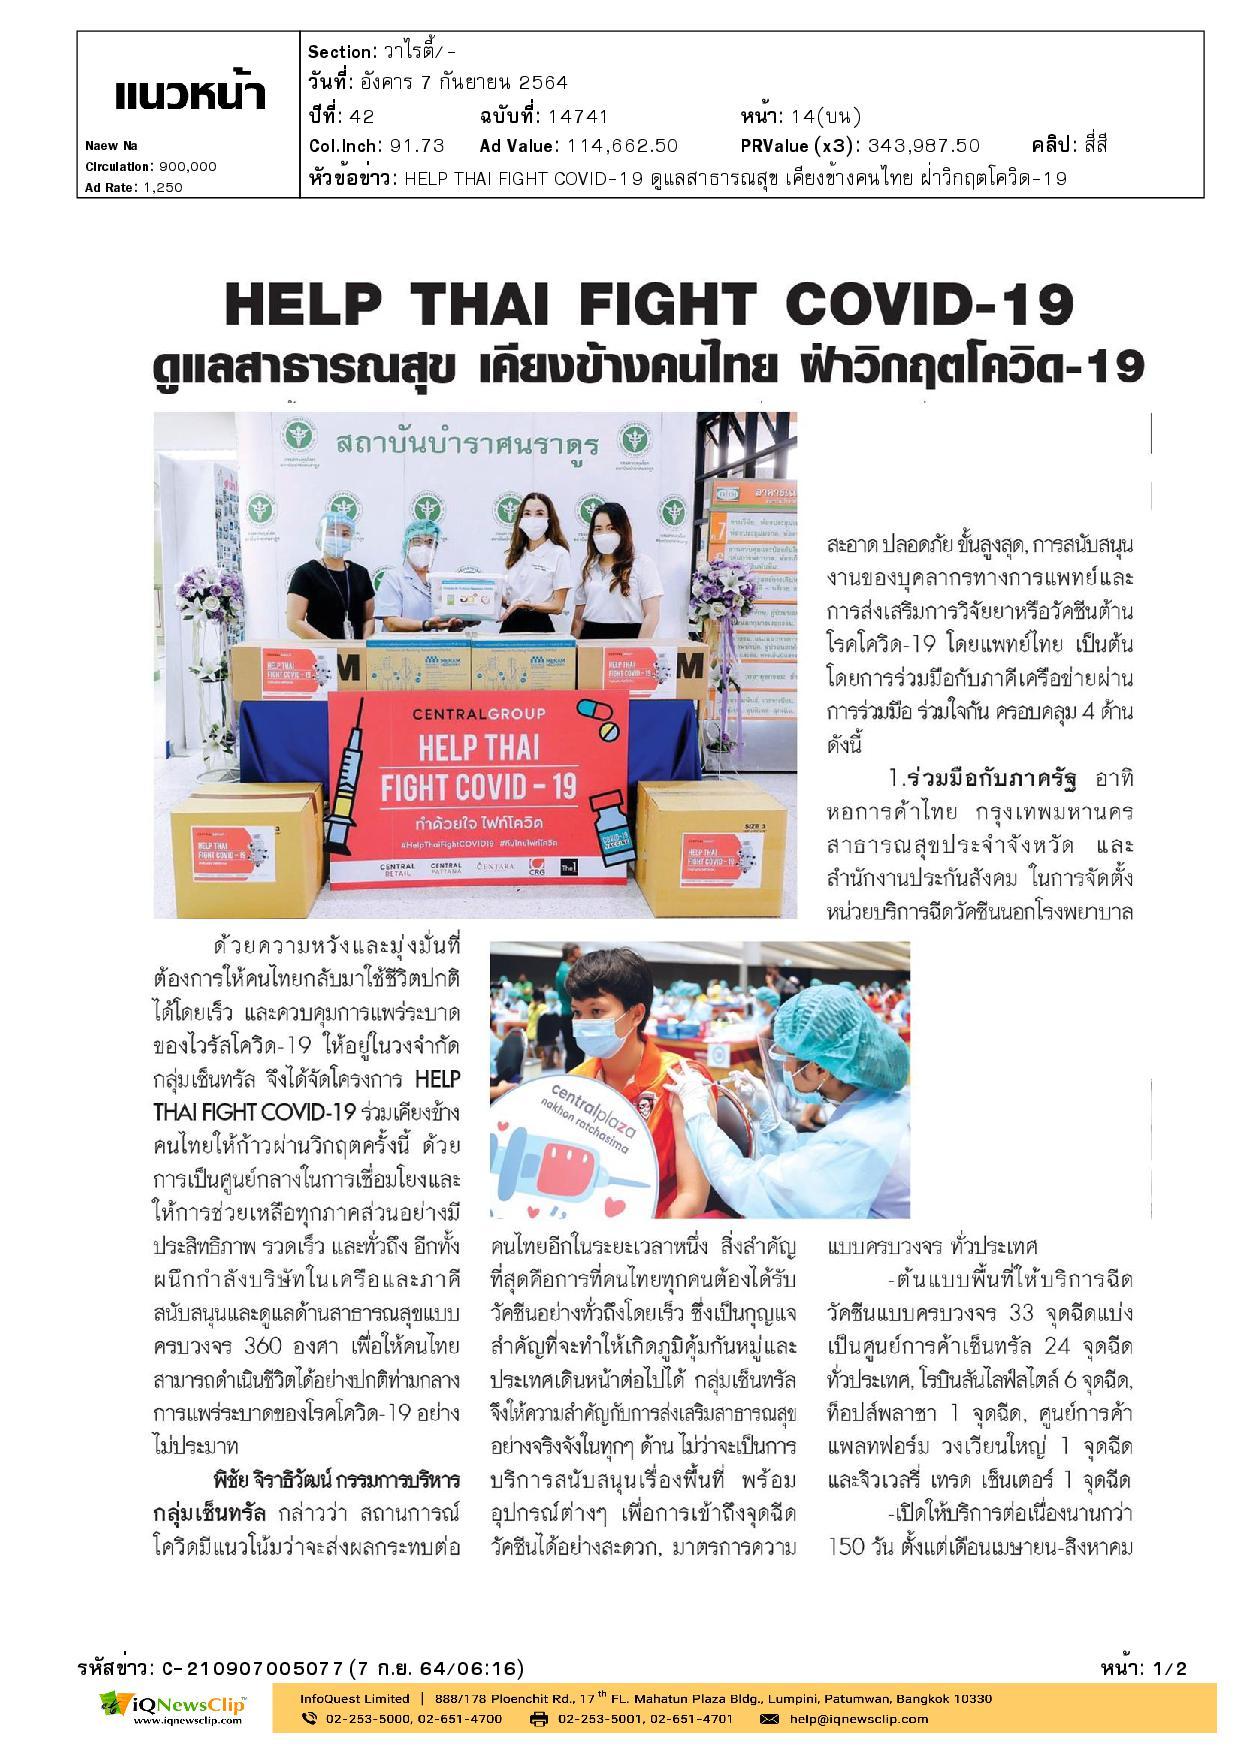 HELP THAI FIGHT COVID-19 ดูแลสาธารณสุข เคียงข้างคนไทย  ฝ่าวิกฤตโควิด-19